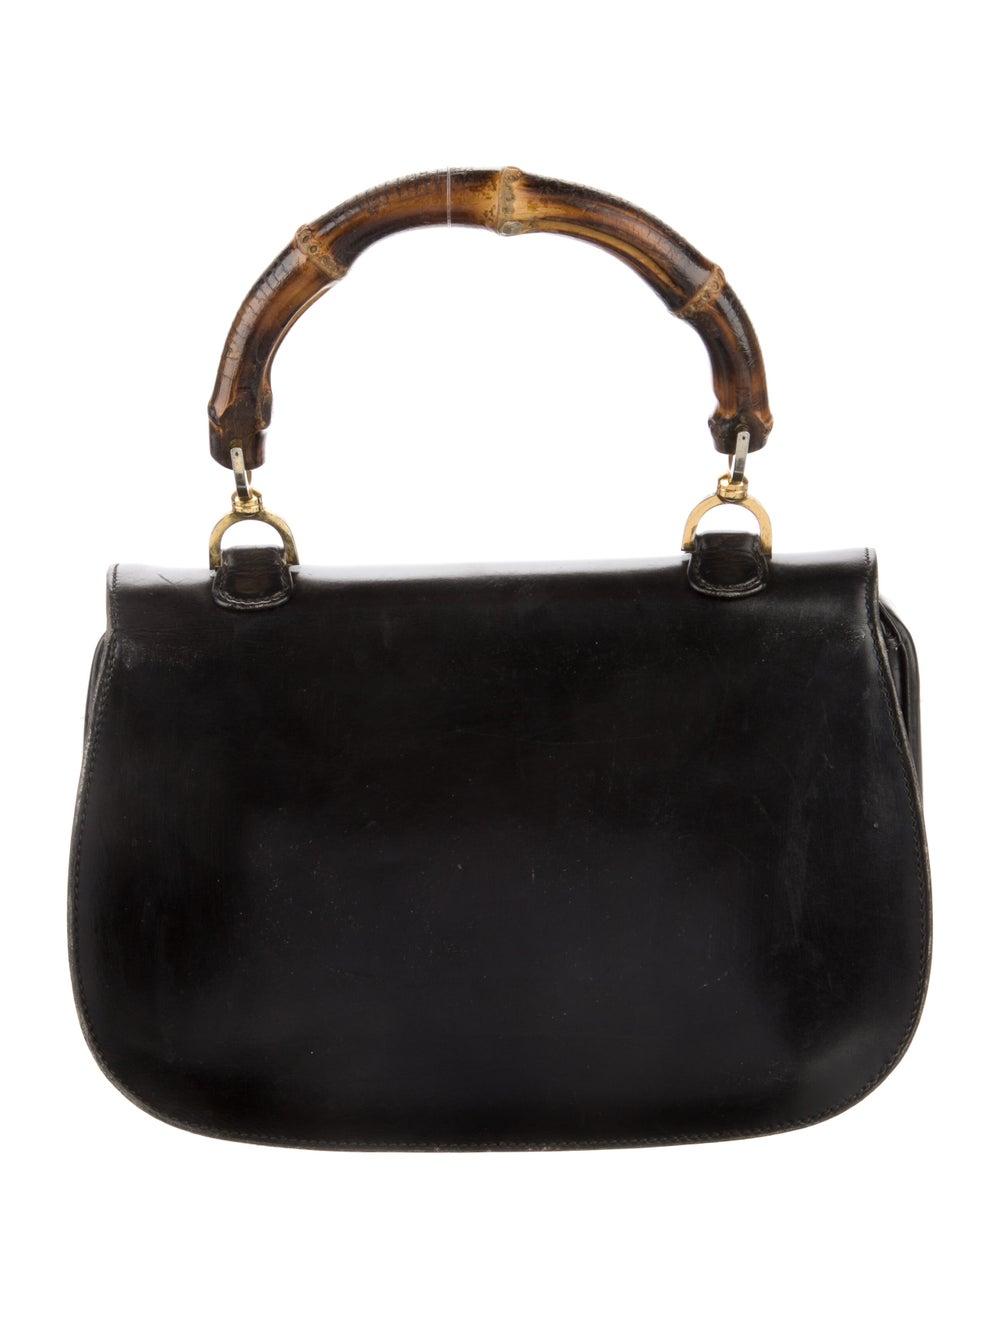 Gucci Vintage Leather Bamboo Top Handle Bag Black - image 4